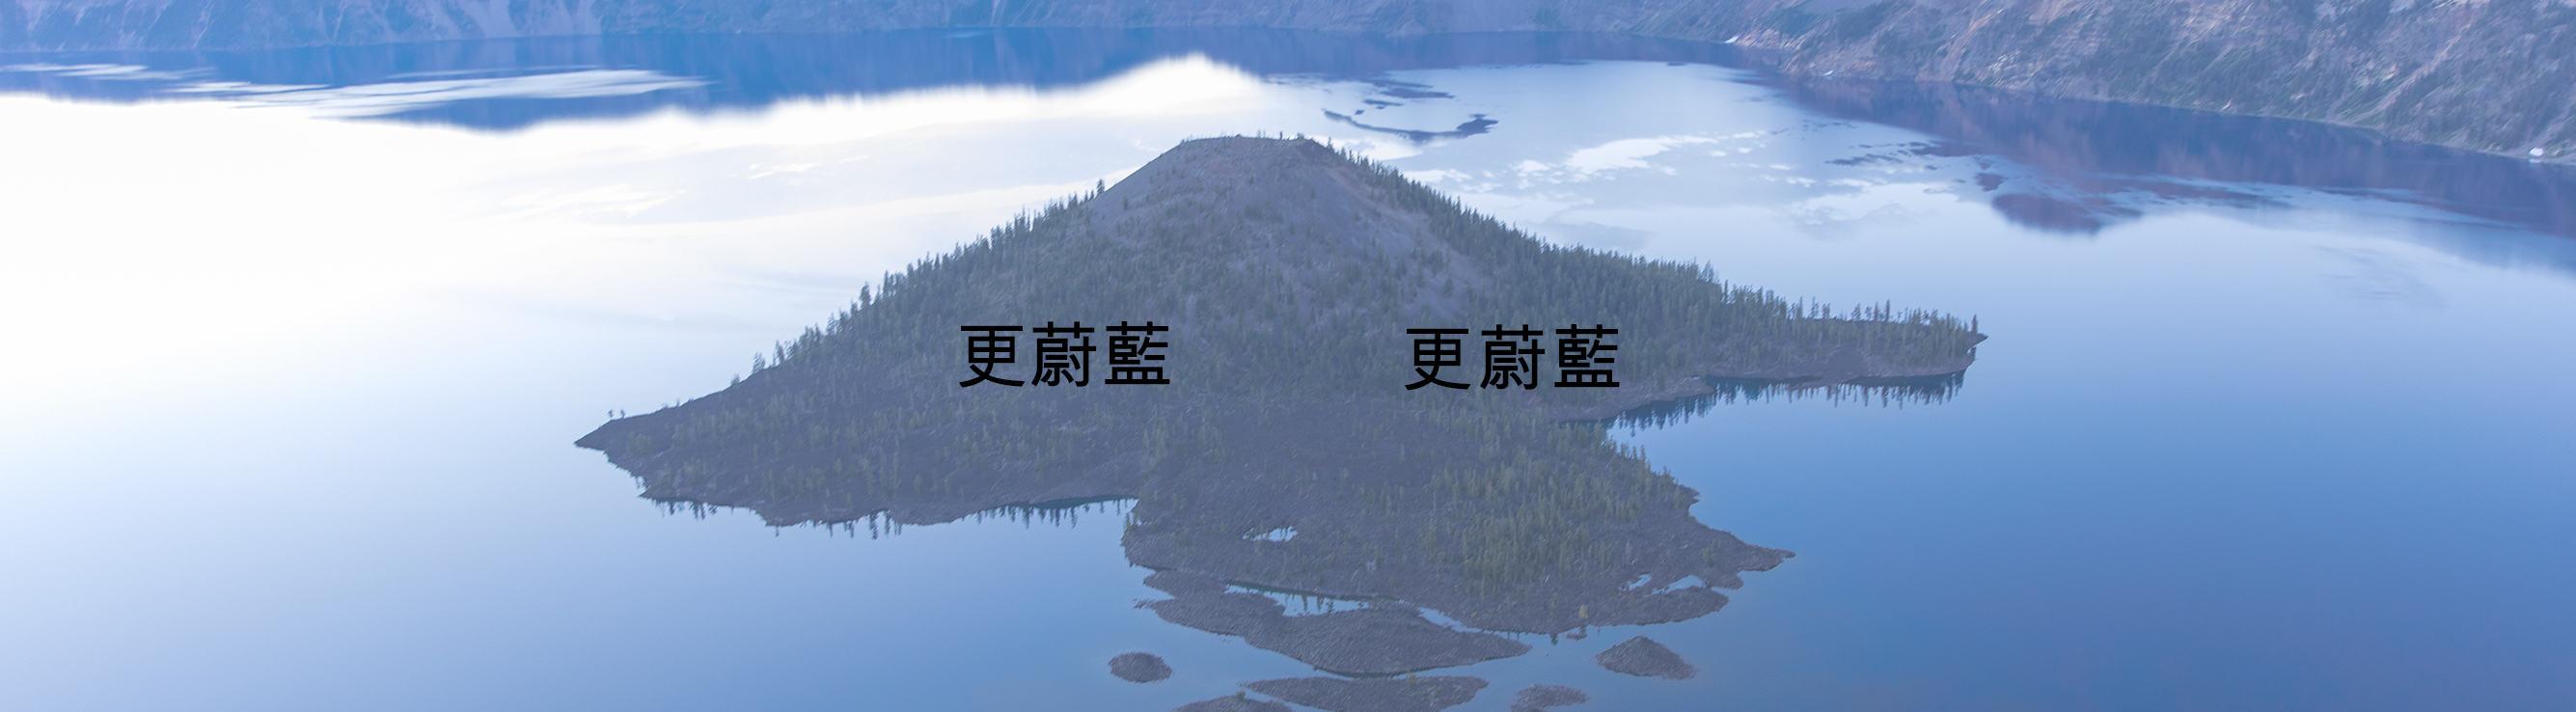 Original Image